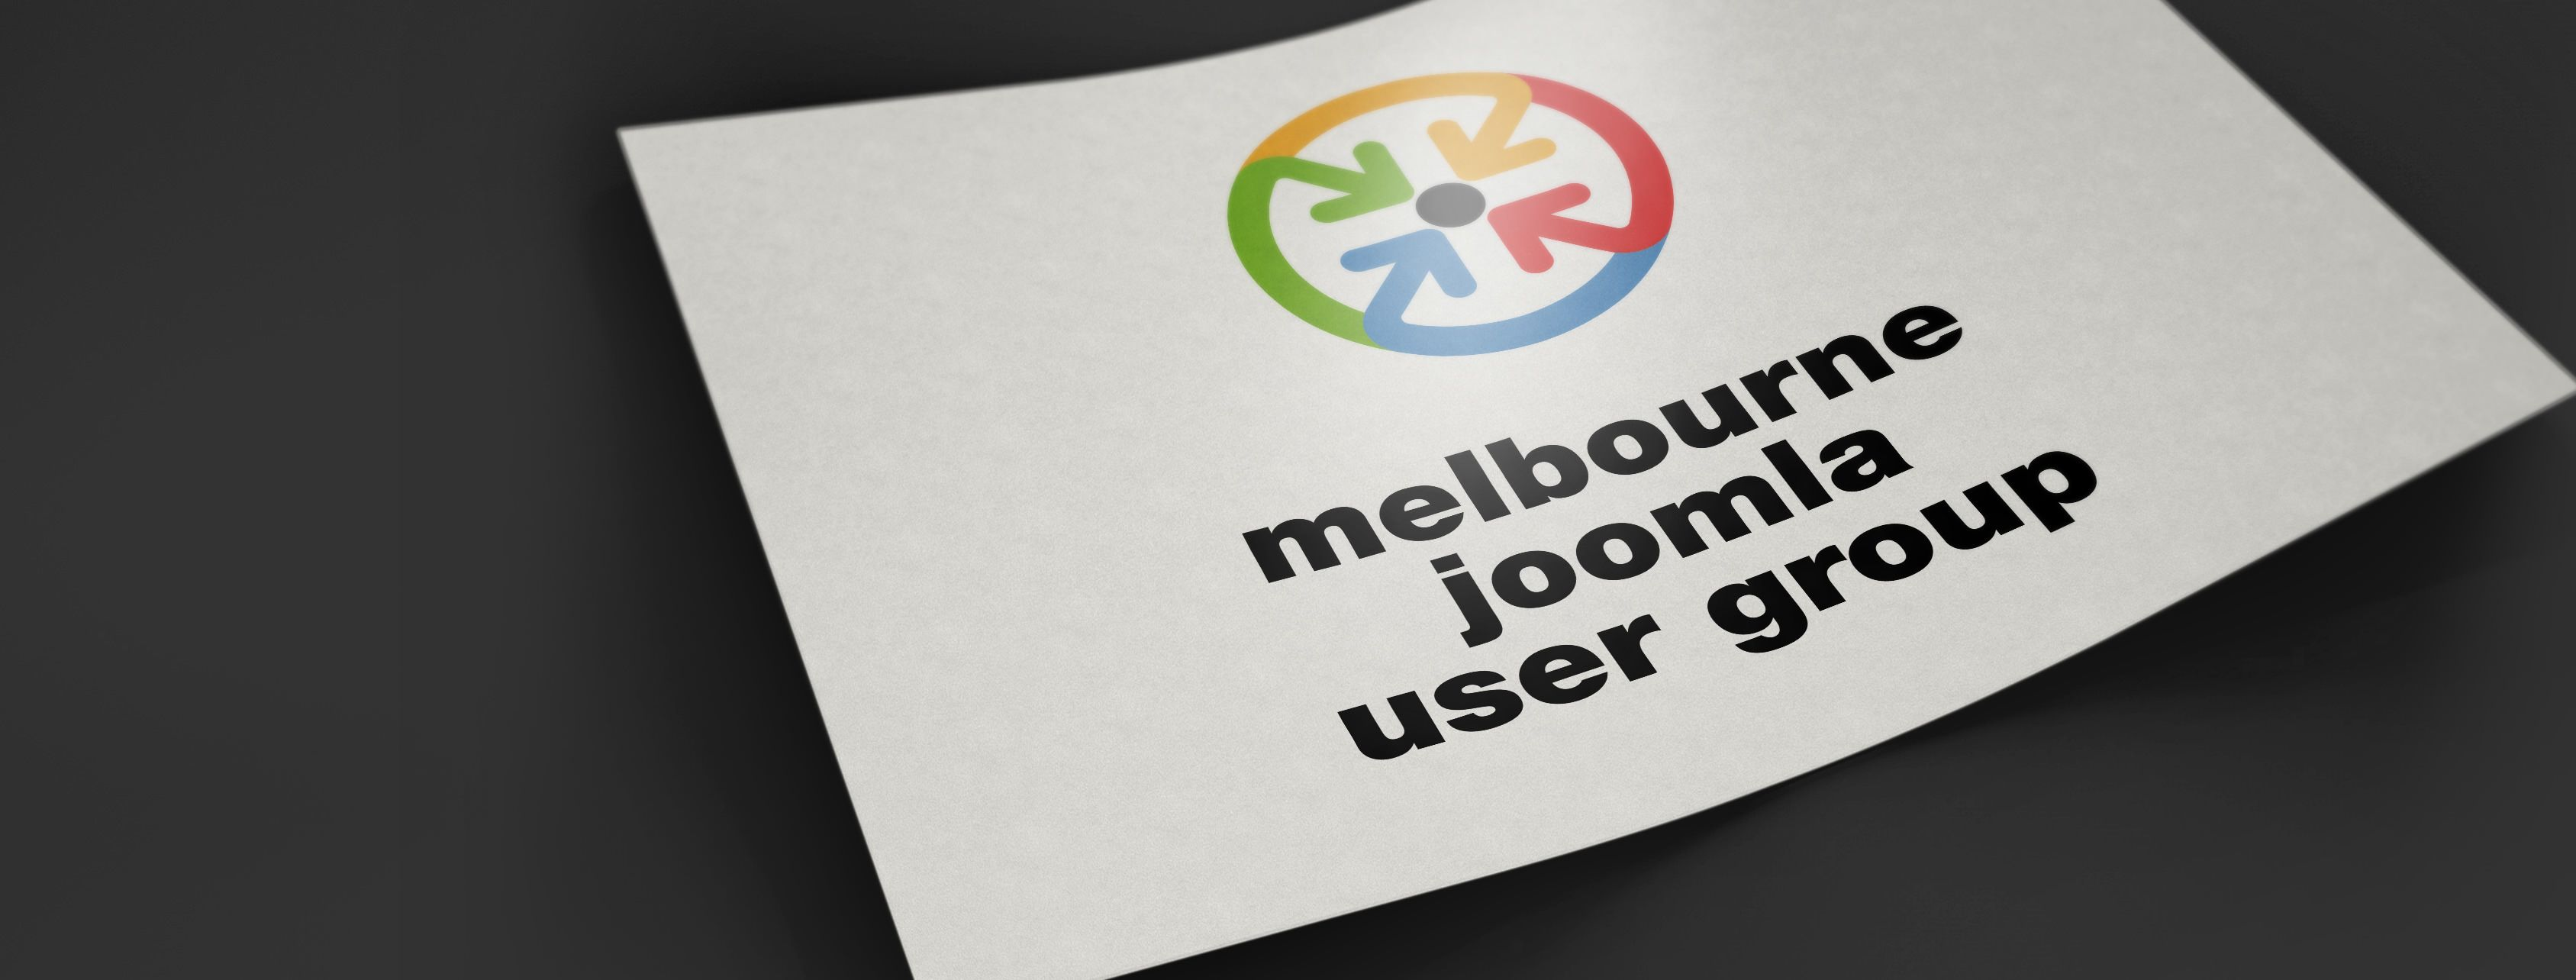 Joomla User Group Melbourne